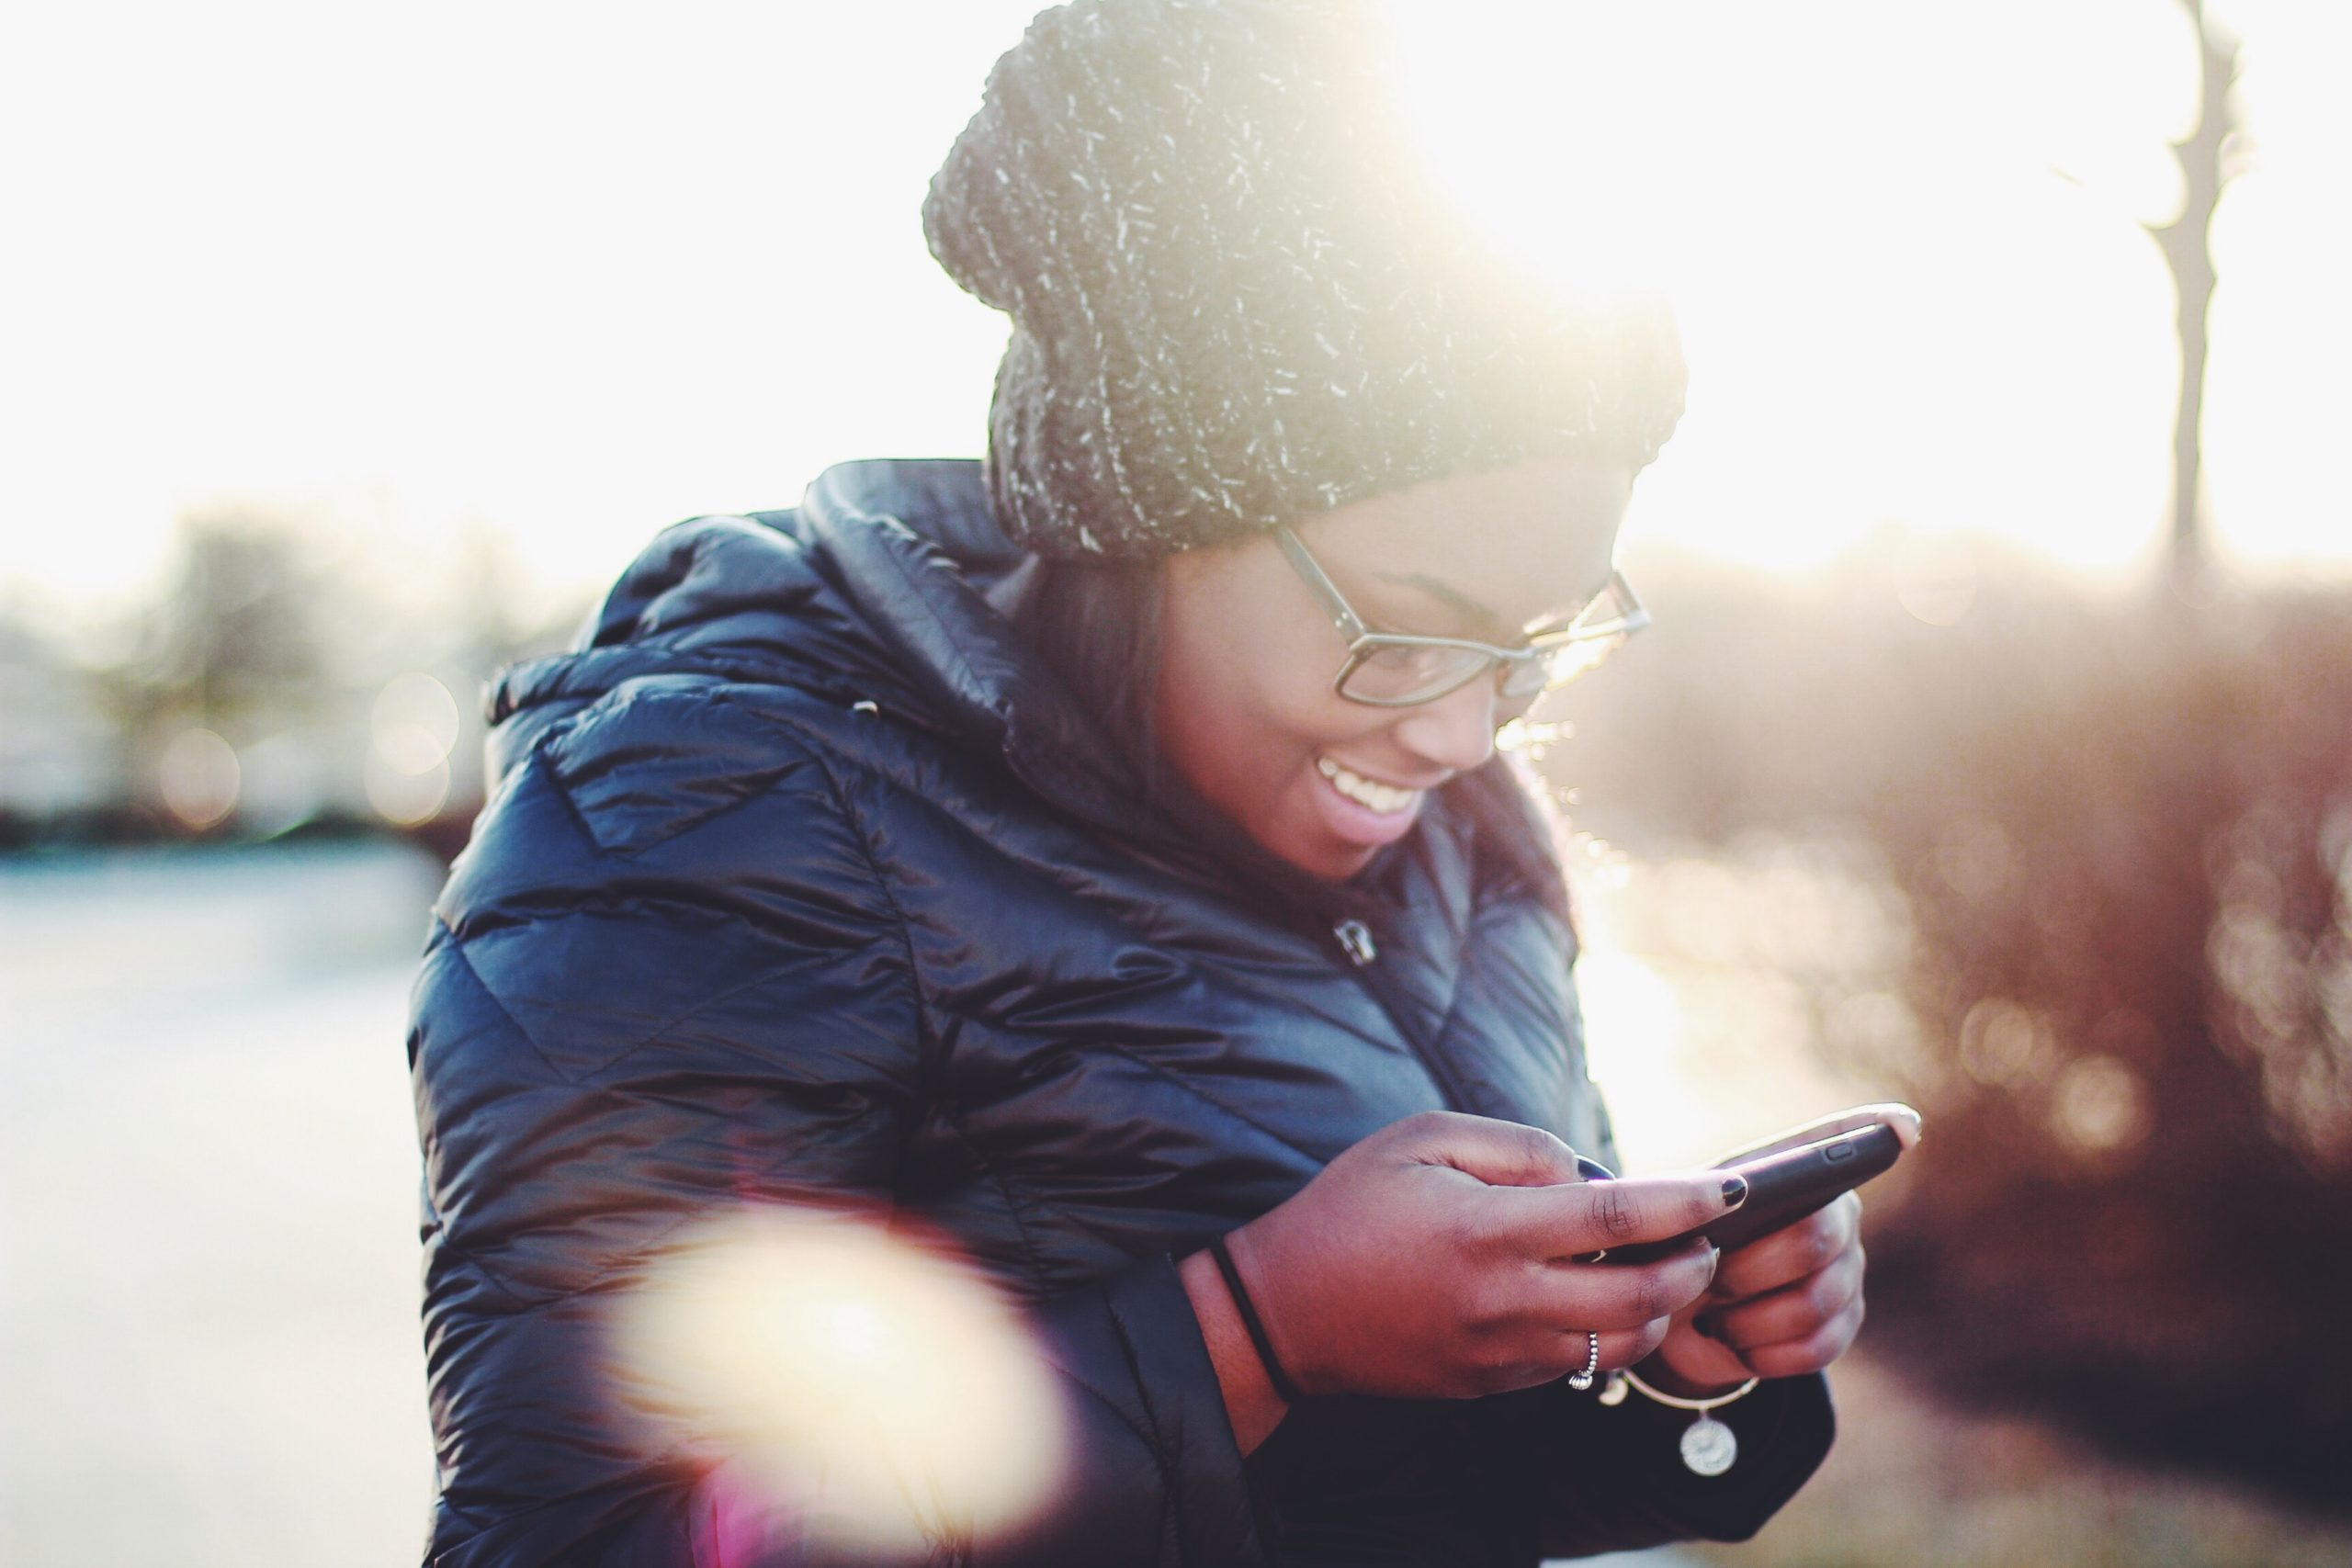 social apps distancing